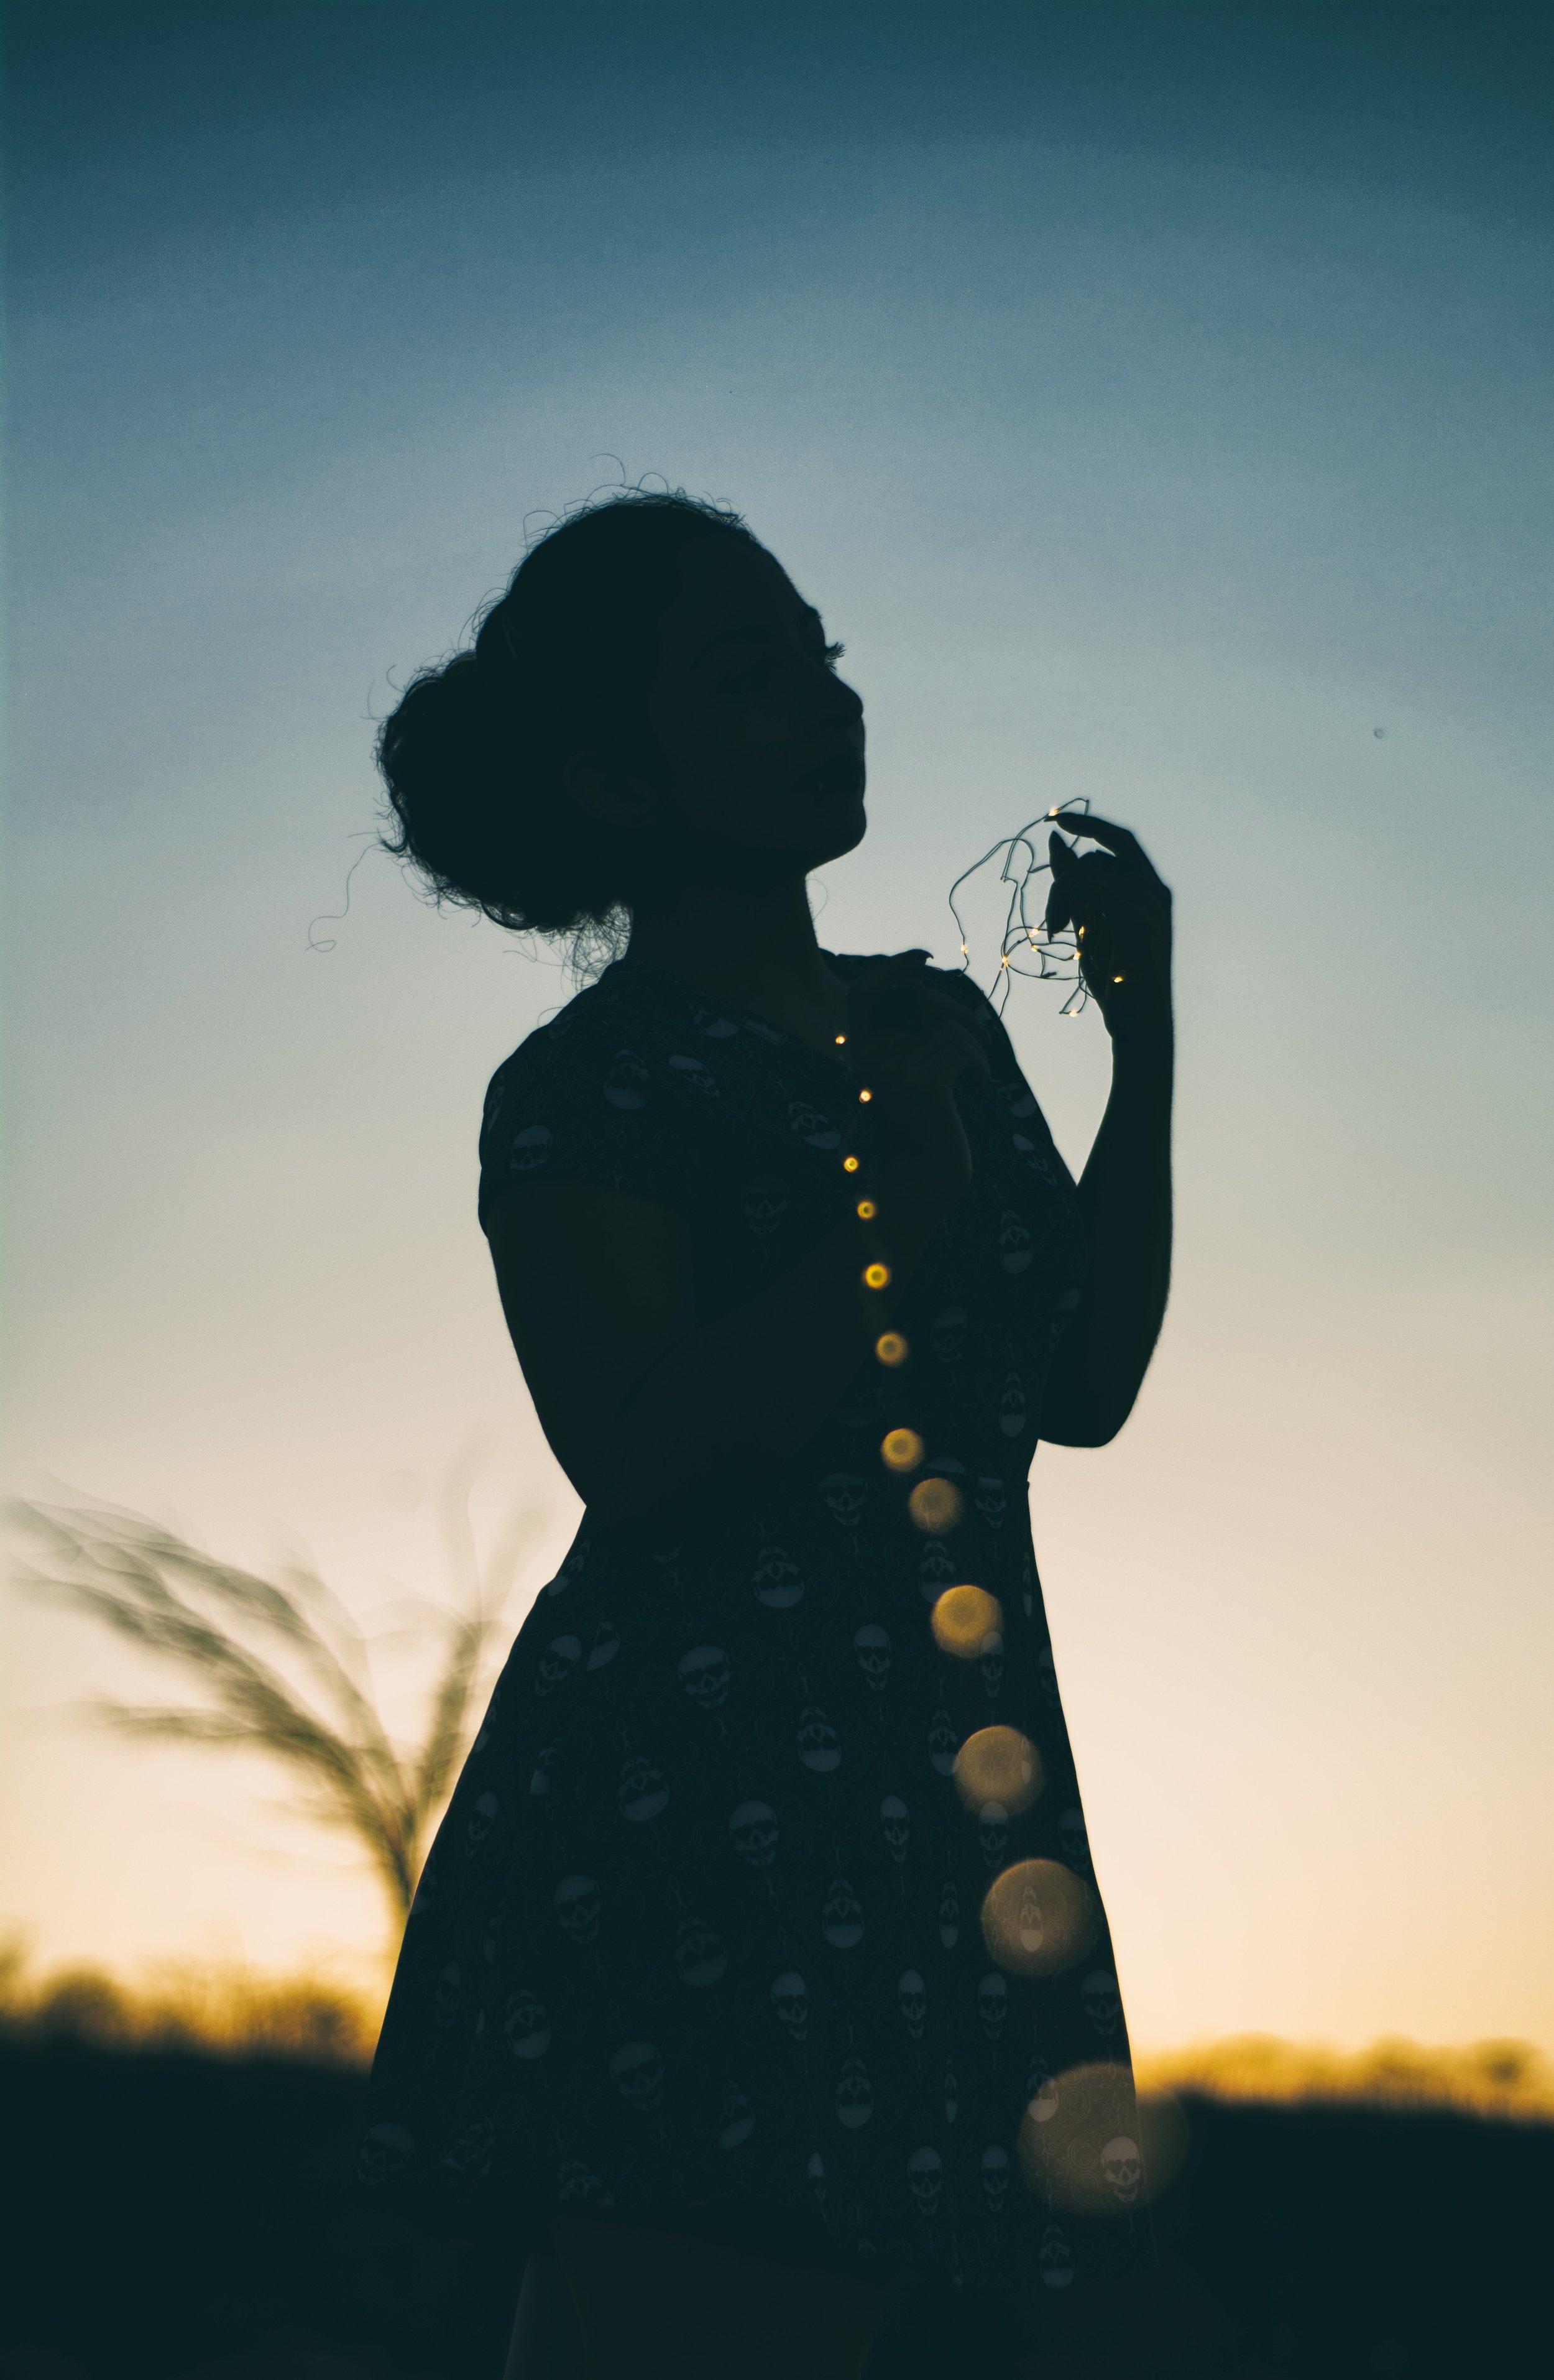 afterglow-backlit-blur-1809611.jpg